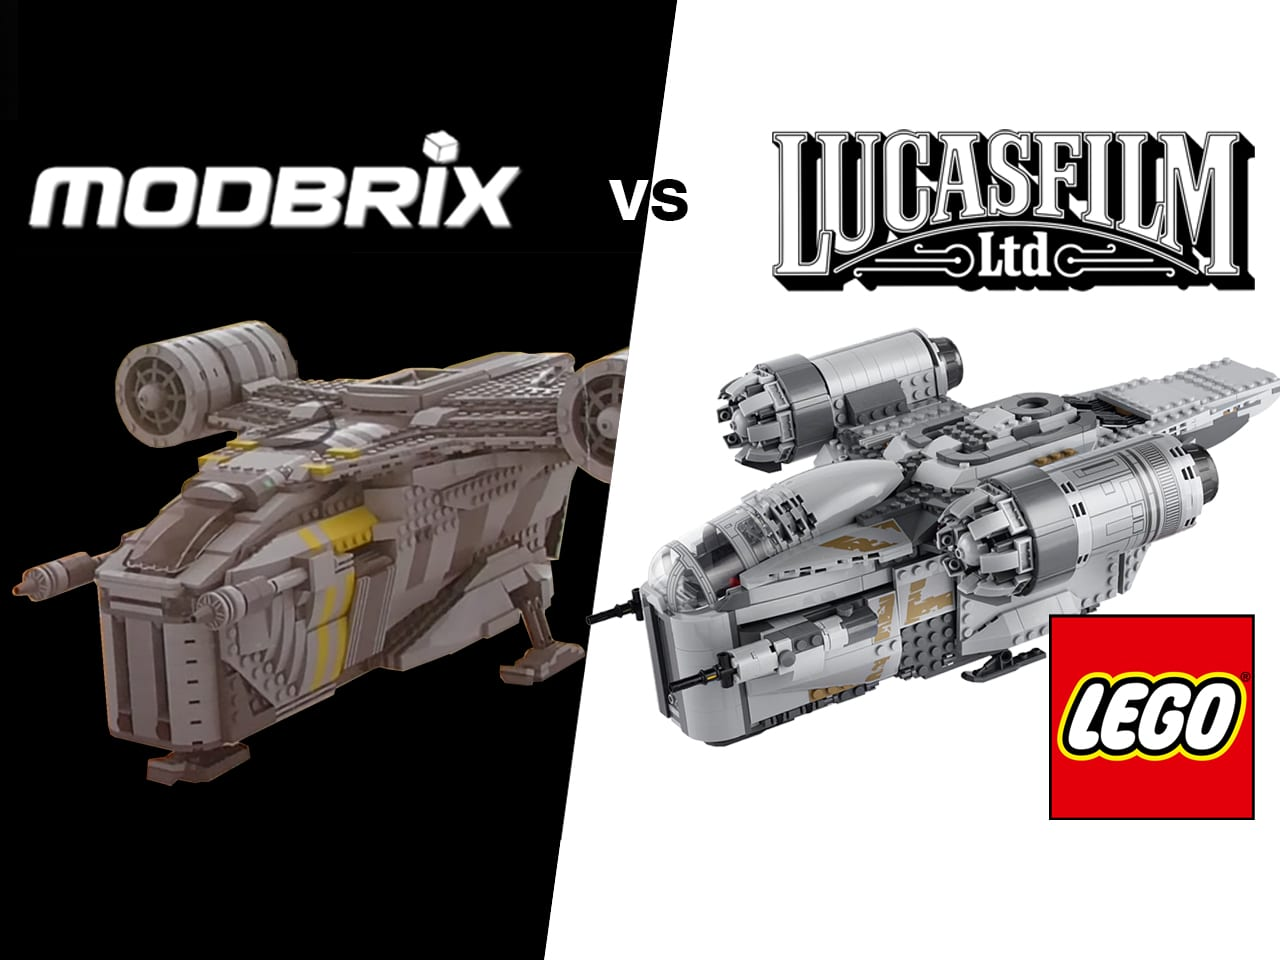 "Modbrix vs LEGO & Lucasfilm: Der Fall der Marke ""Razor Crest"""